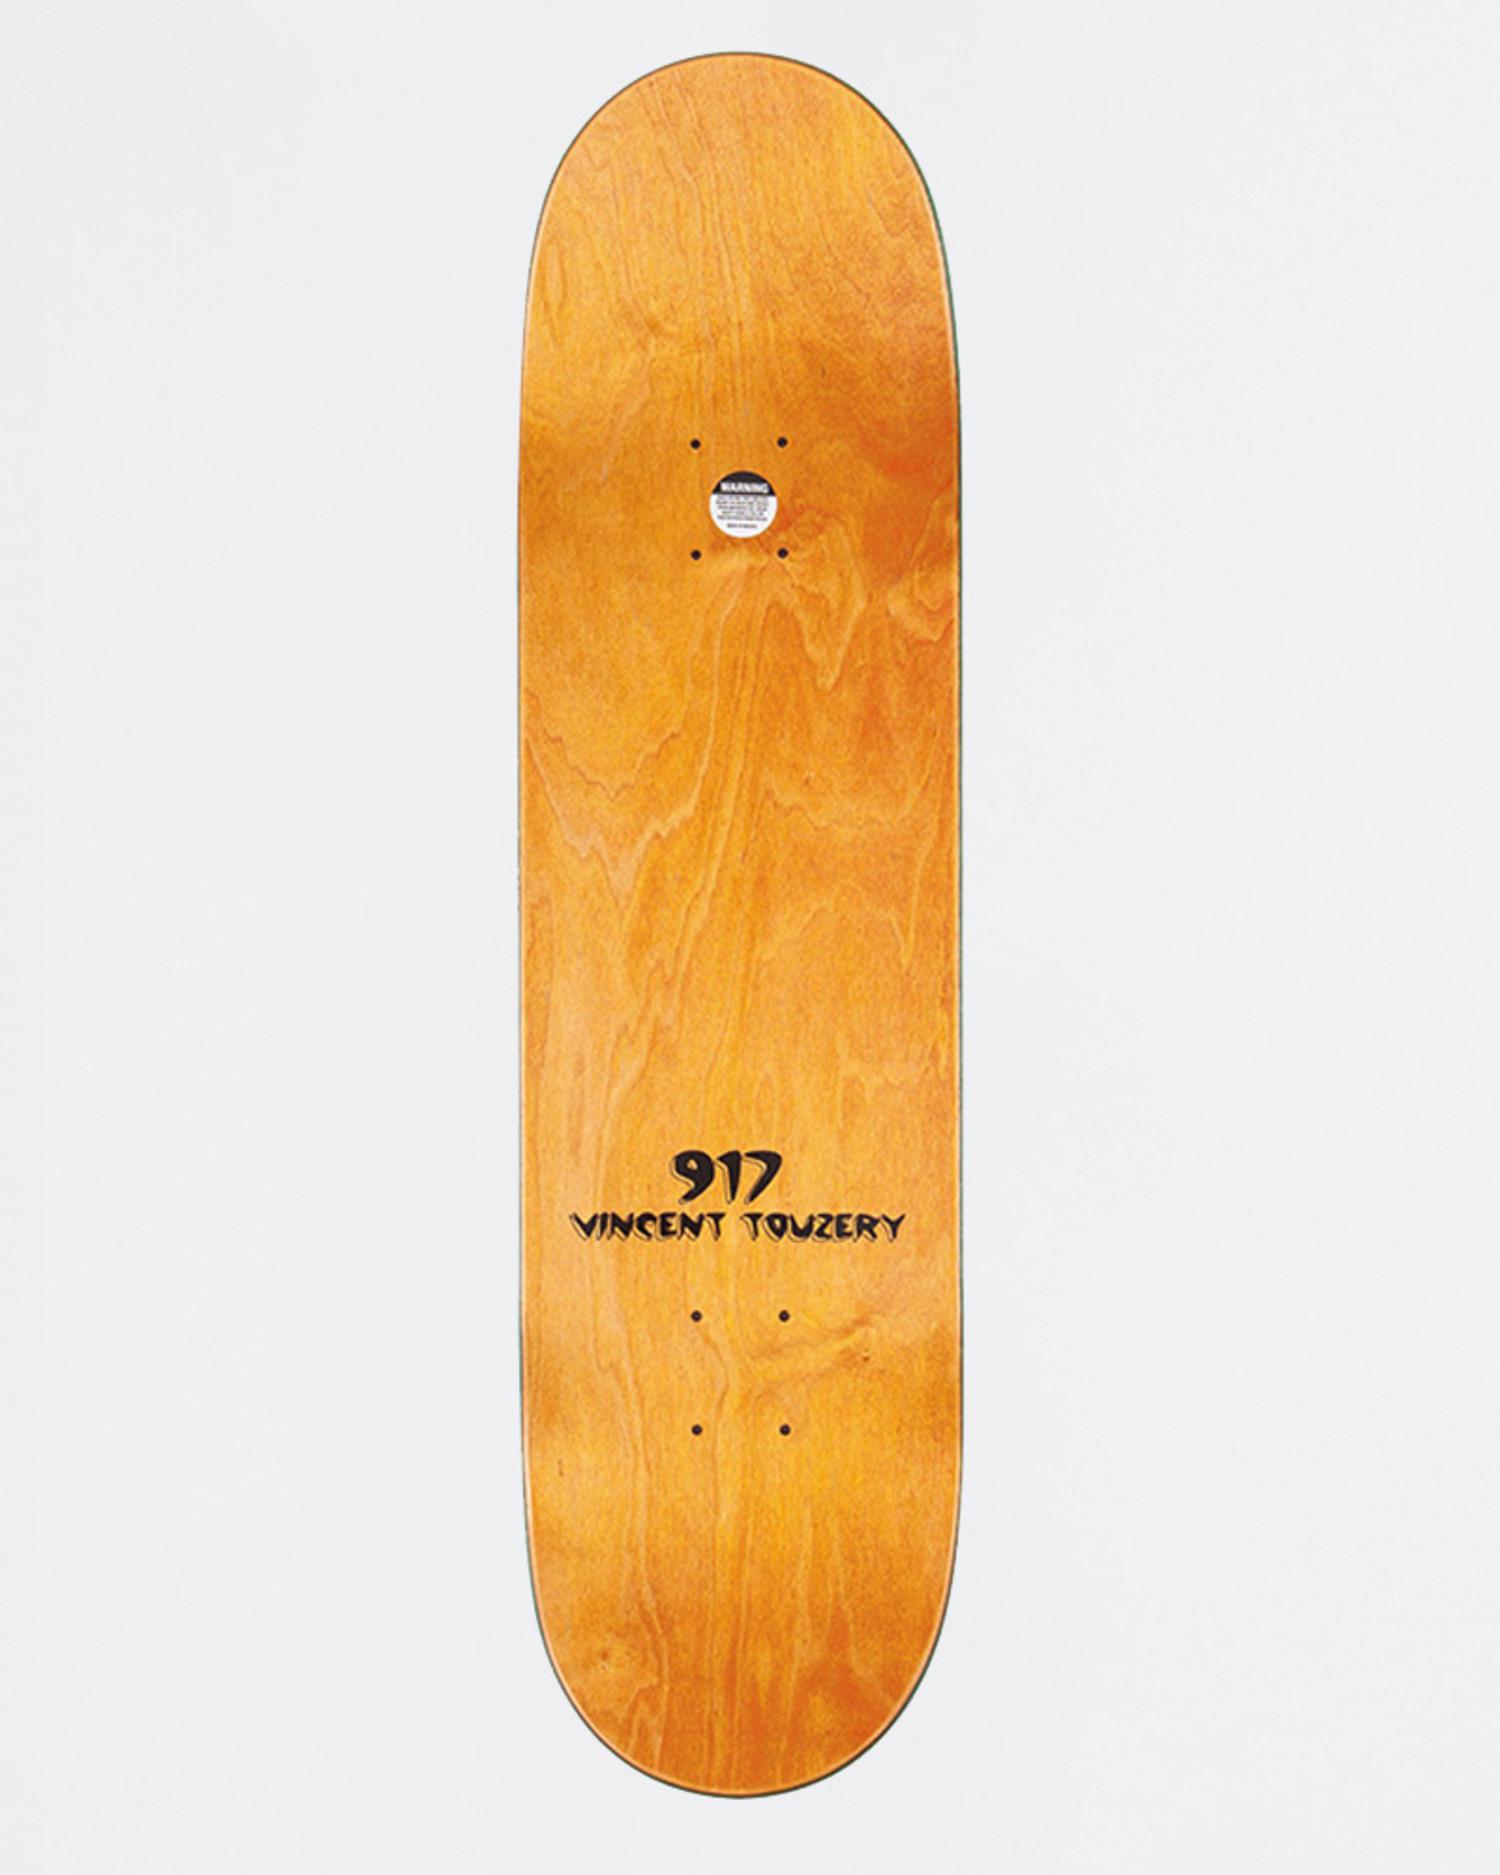 "Call Me 917 Cyrus Serie/Touzery Deck/Slick Bottom 8,25"" Deck"